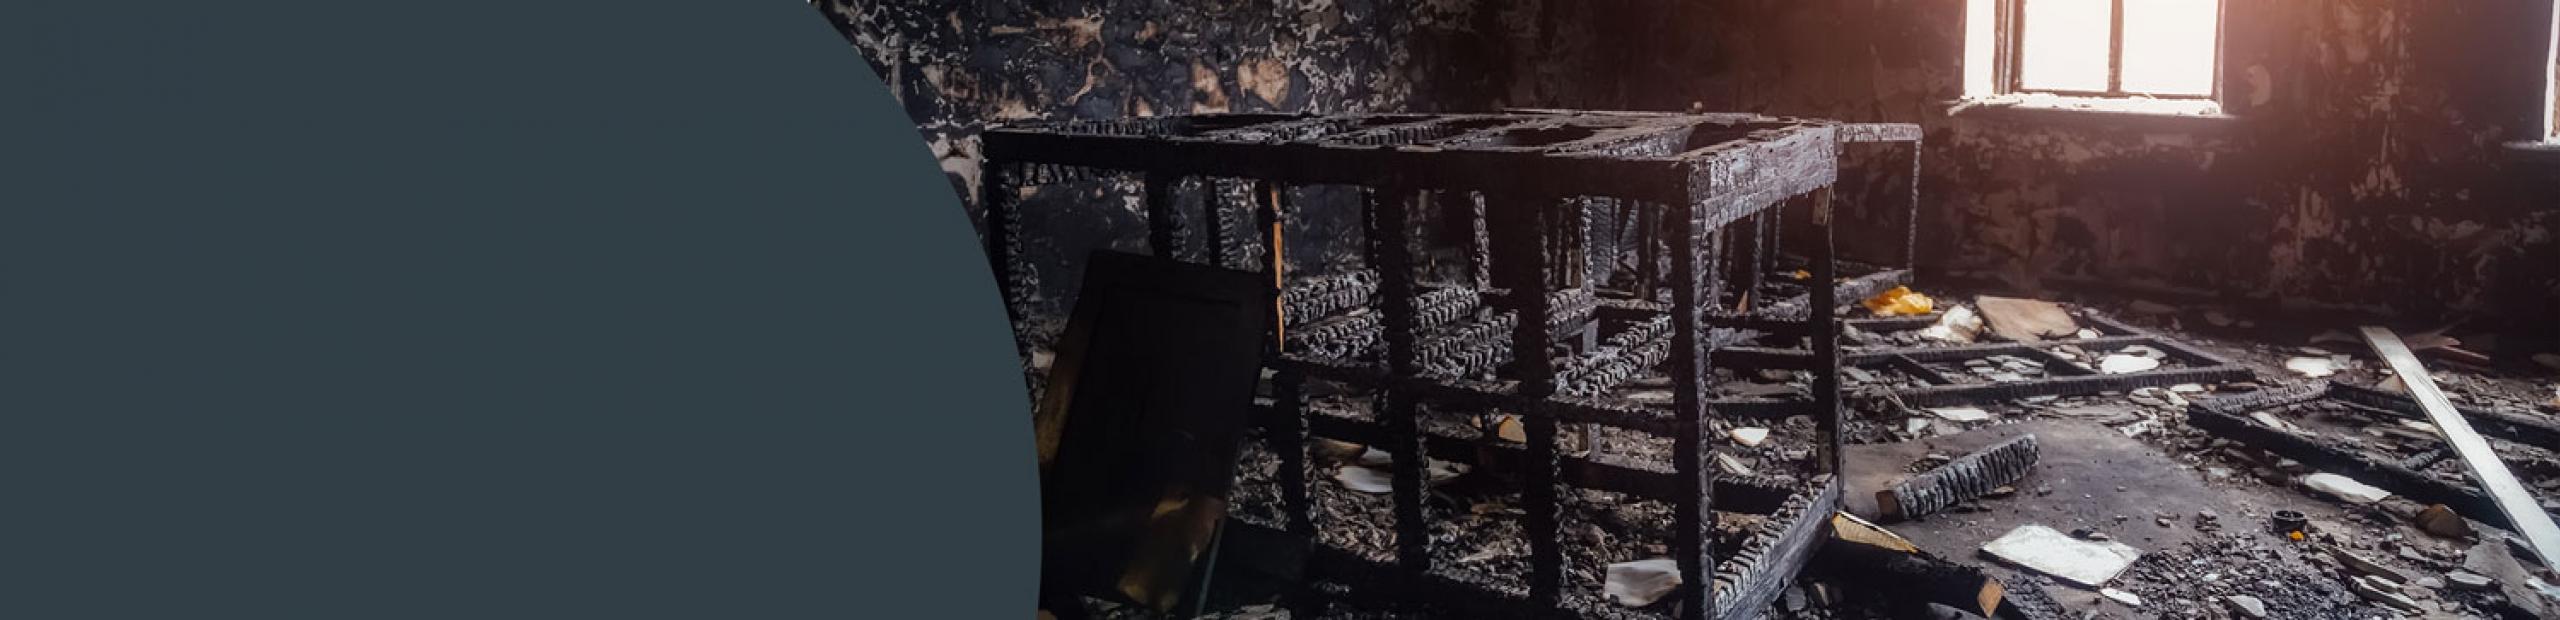 Fire & smoke damage cleaning camden